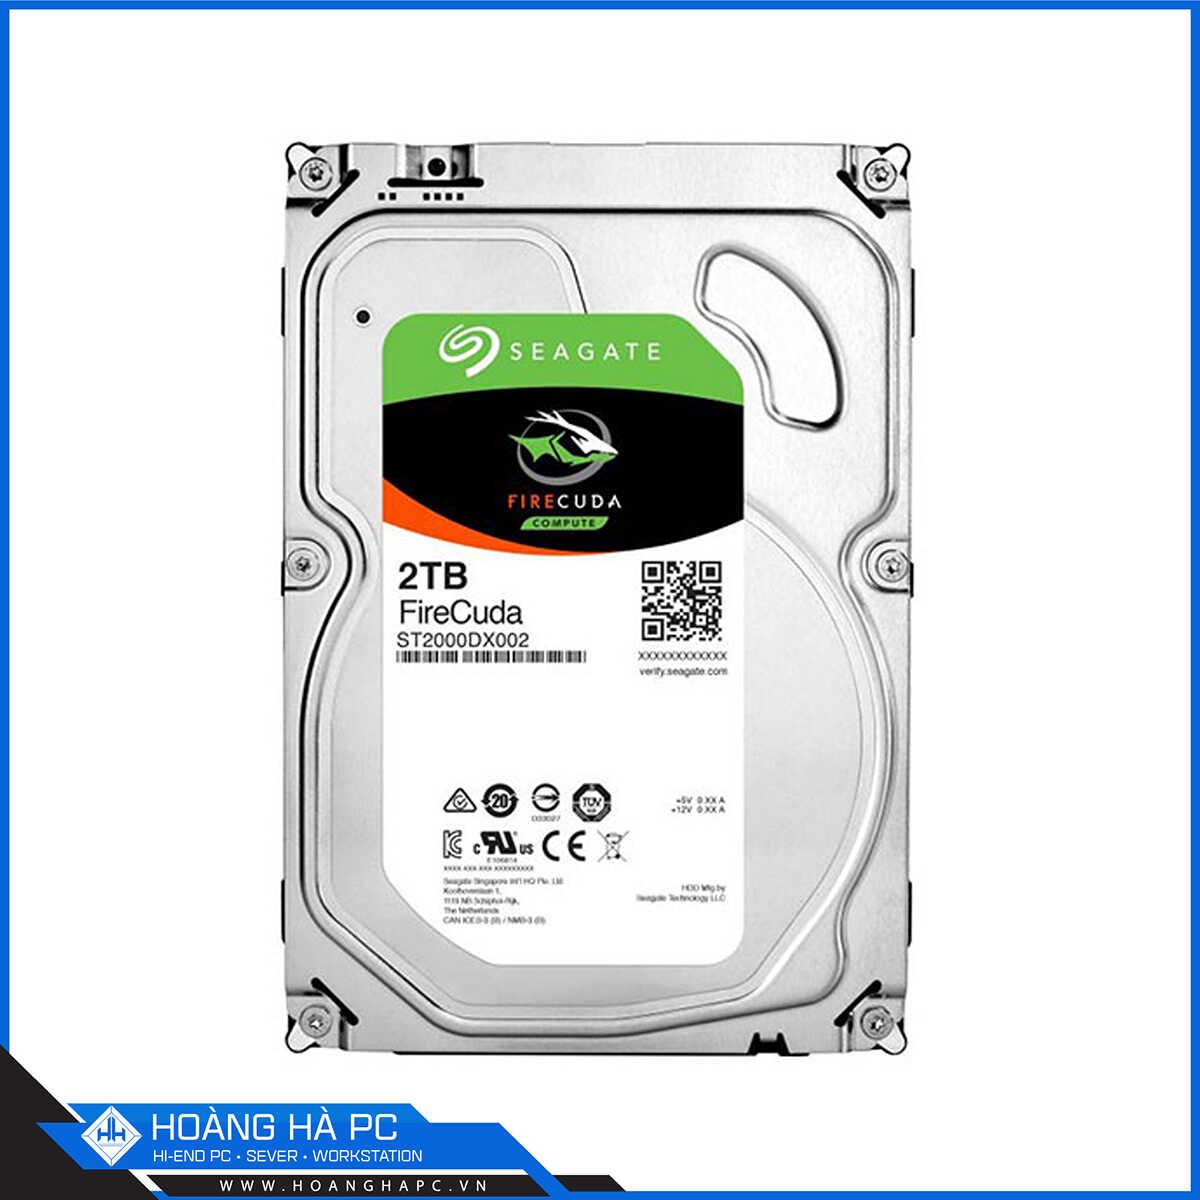 Ổ Cứng HDD Seagate Firecuda 2TB